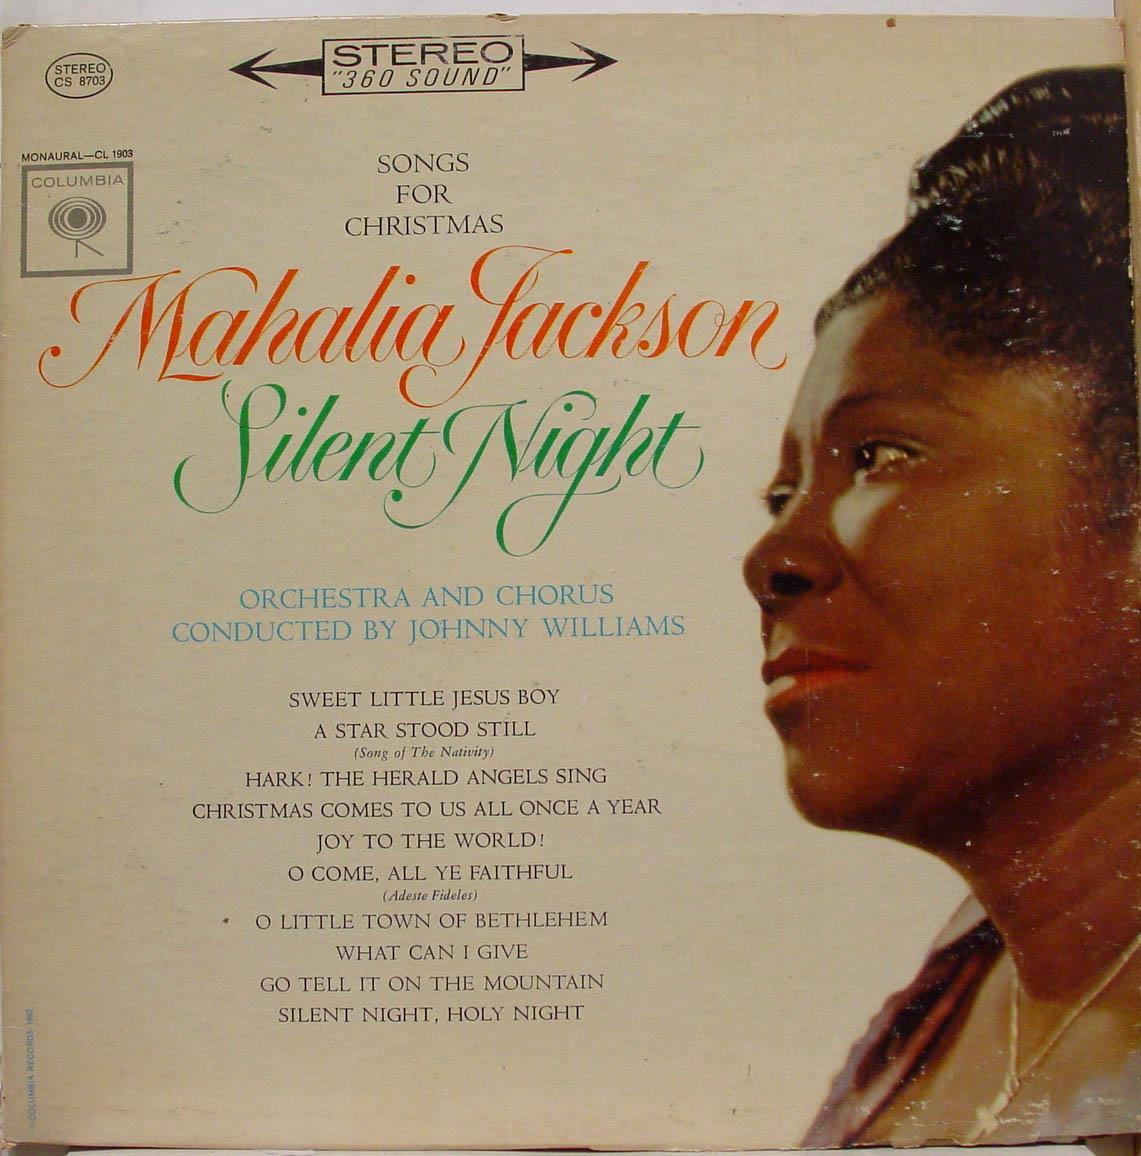 6 Eye Stereo Mahalia Jackson Silent Night Songs For Christmas Lp Vg Cs 8703